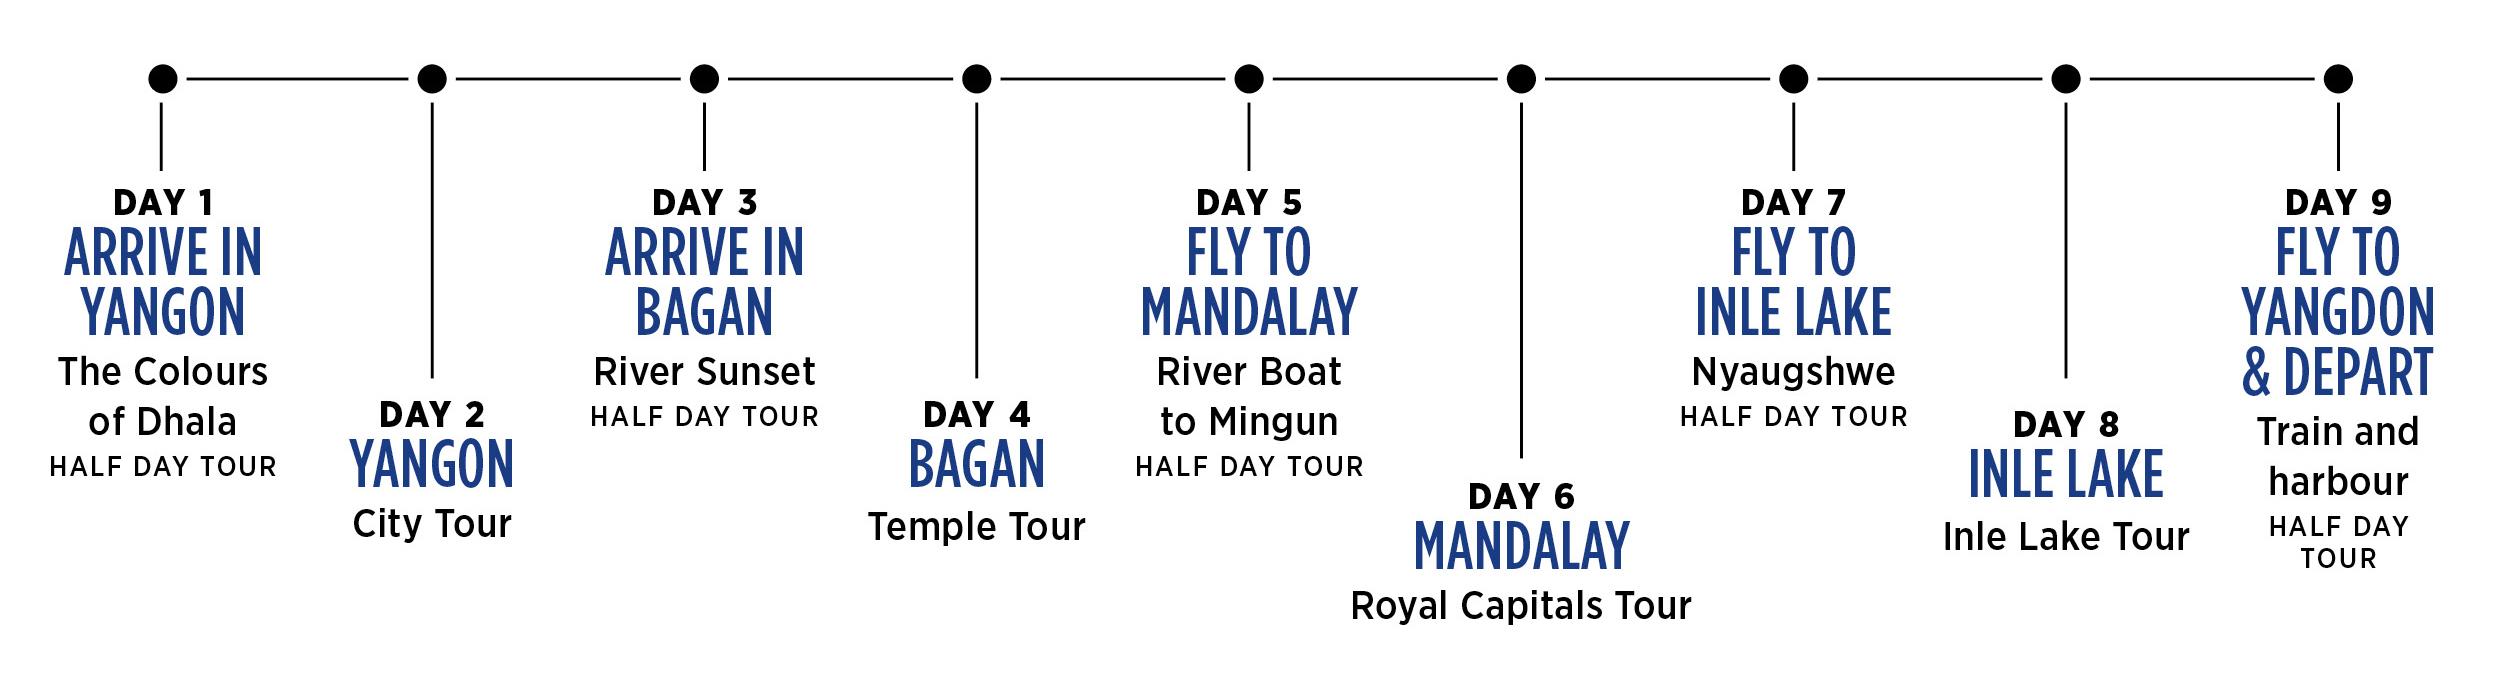 http://destinationsmagazine.com/wp-content/uploads/2017/03/Myanmar-9Day_v3.jpg